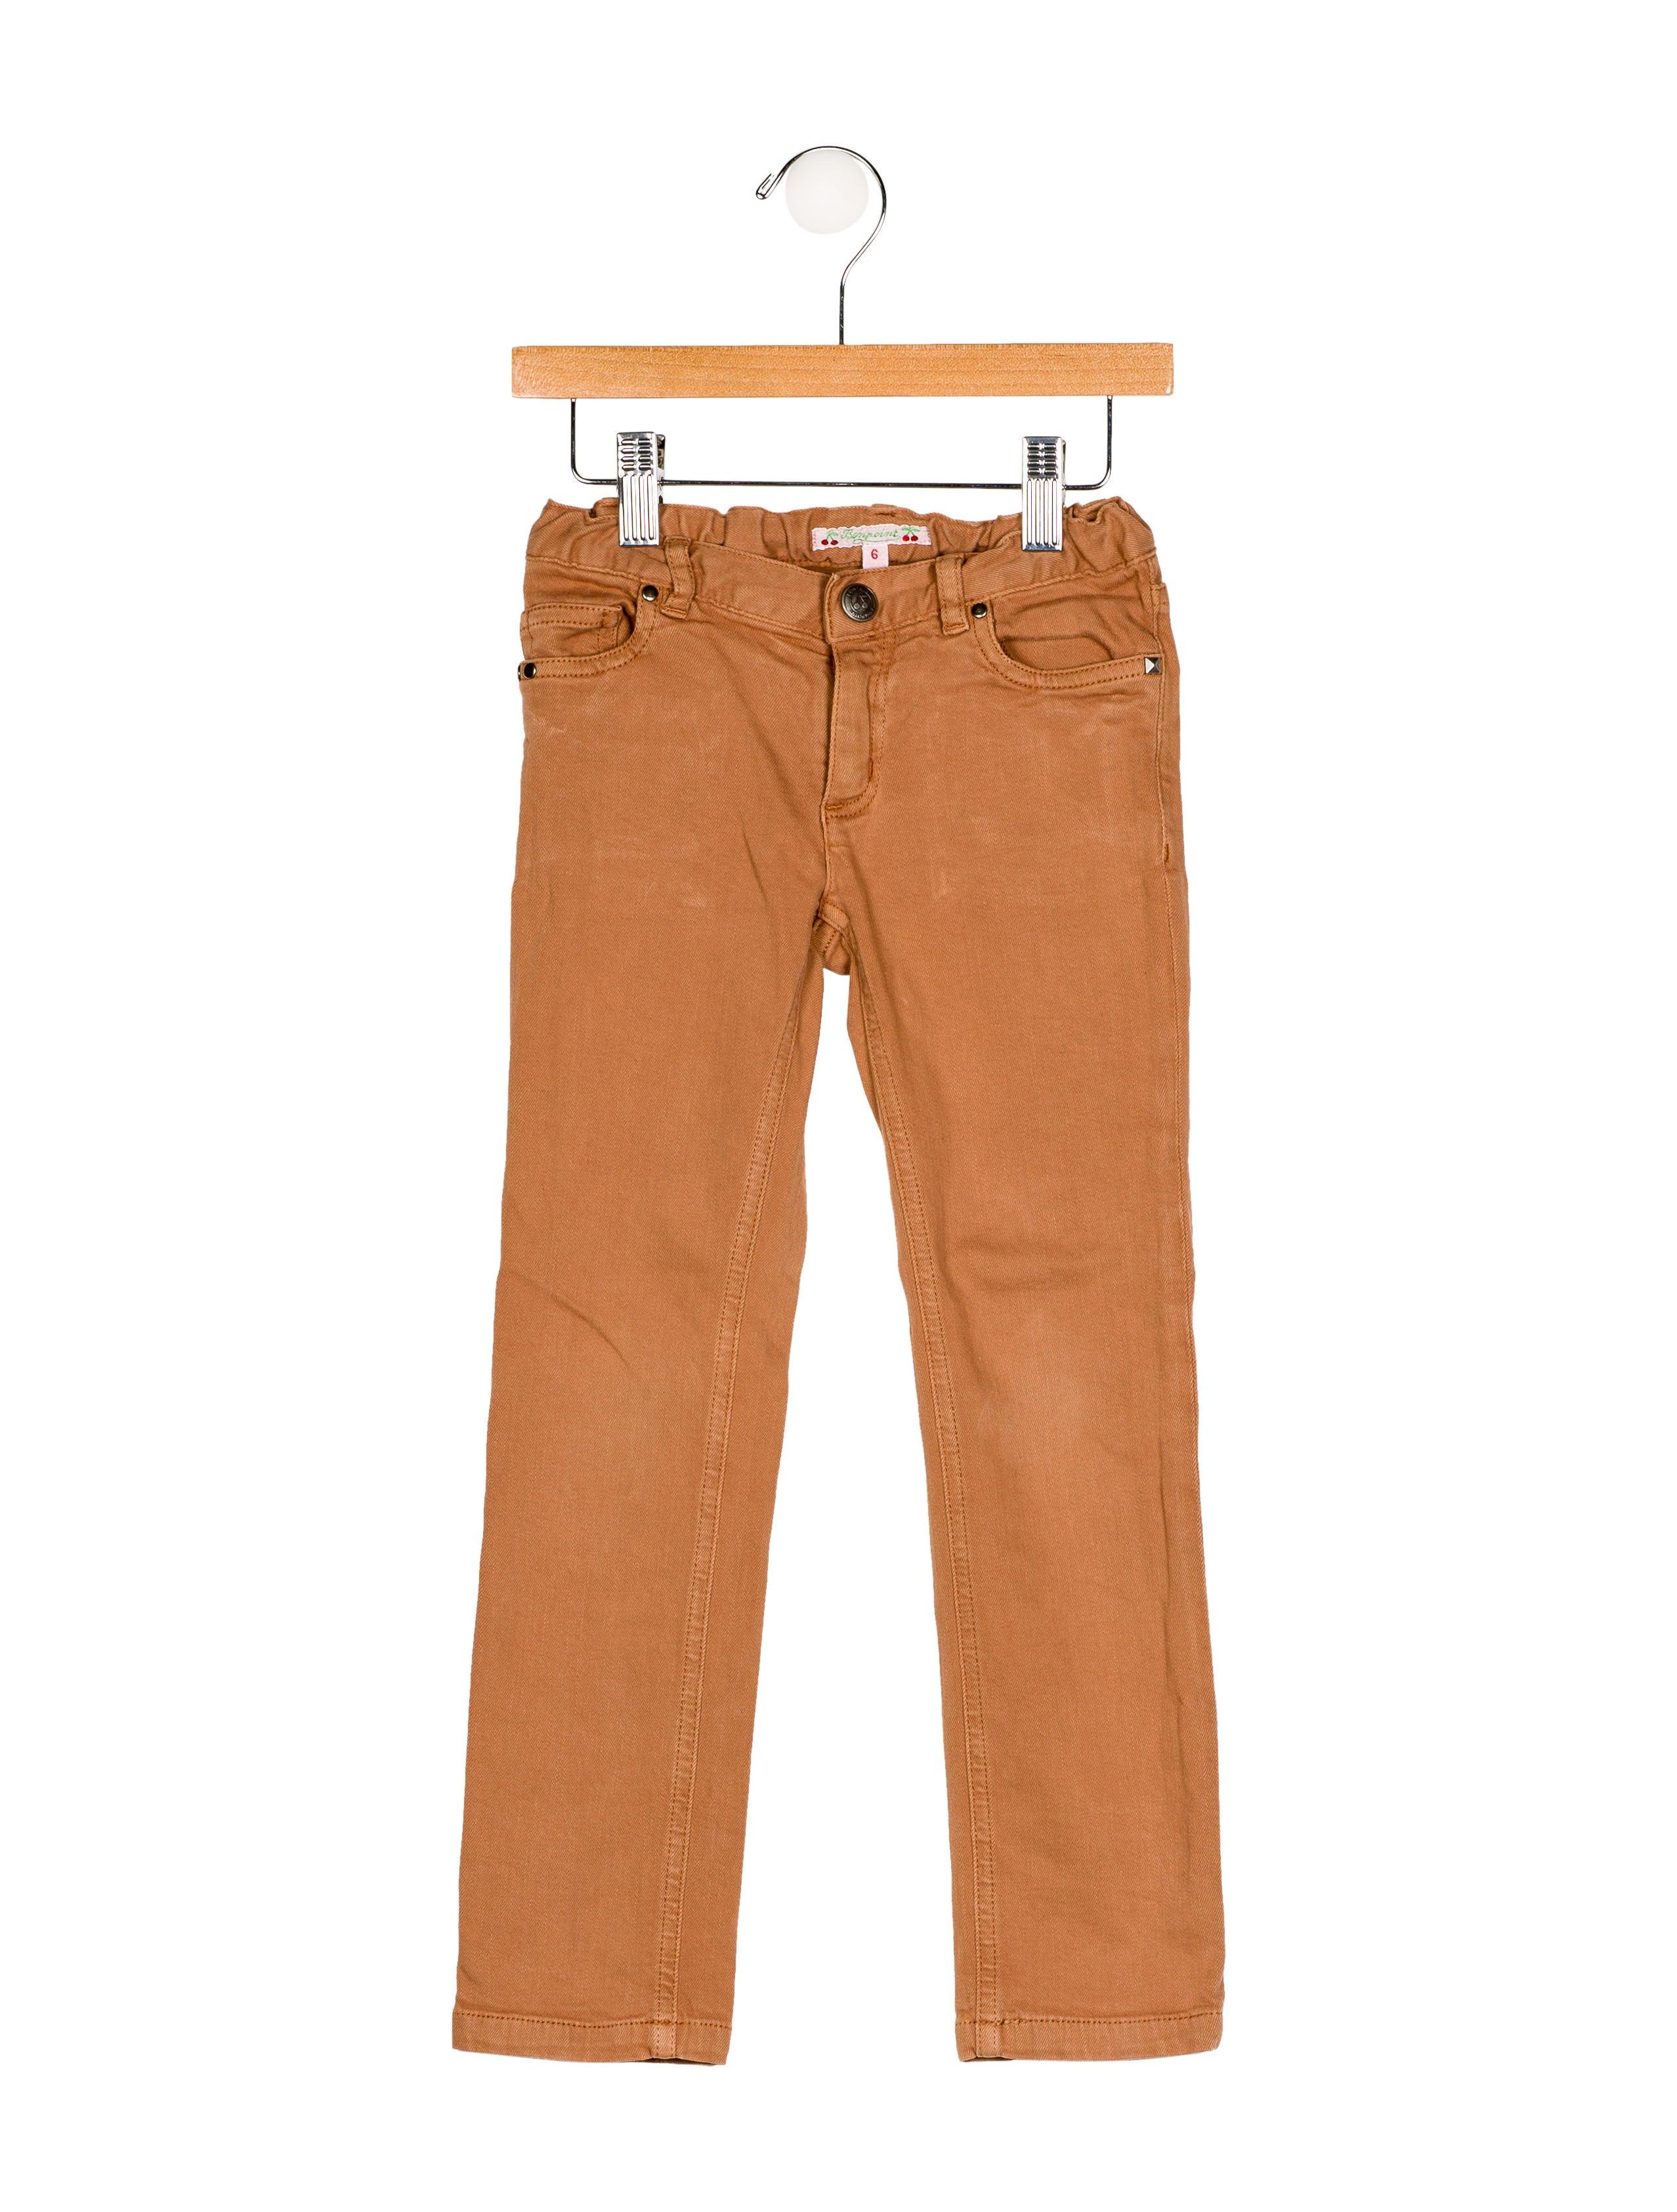 BONPOINT Jean girl skinny fit Mb5gB7W8oi